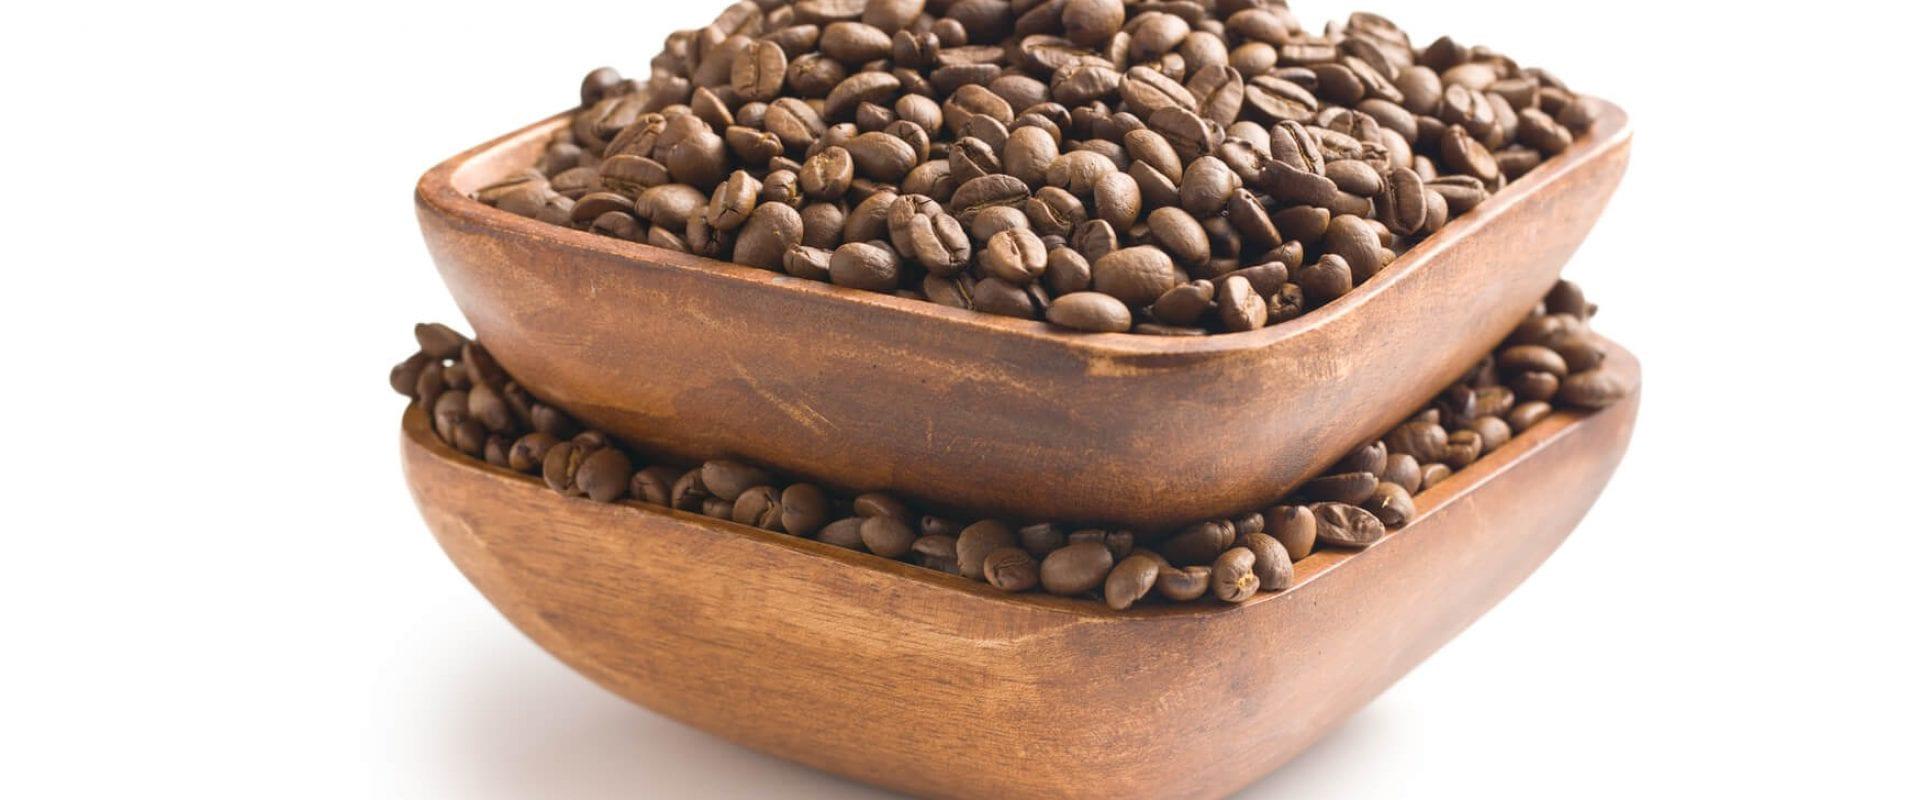 Kaffee - berühmt-berüchtigter Wachmacher